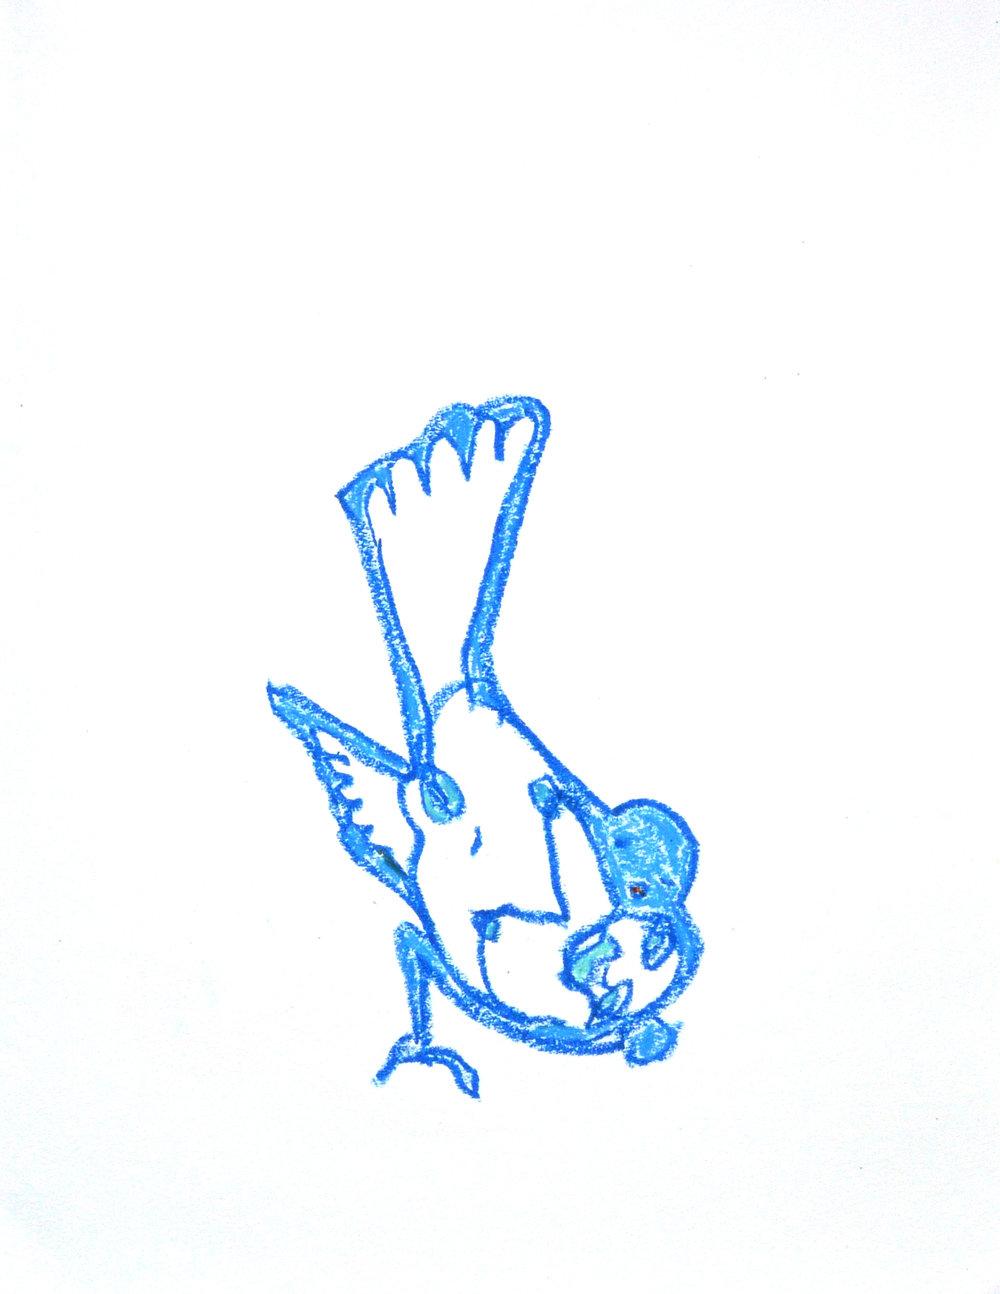 bird , 2018. Oil Pastel. 14 x 11 in.